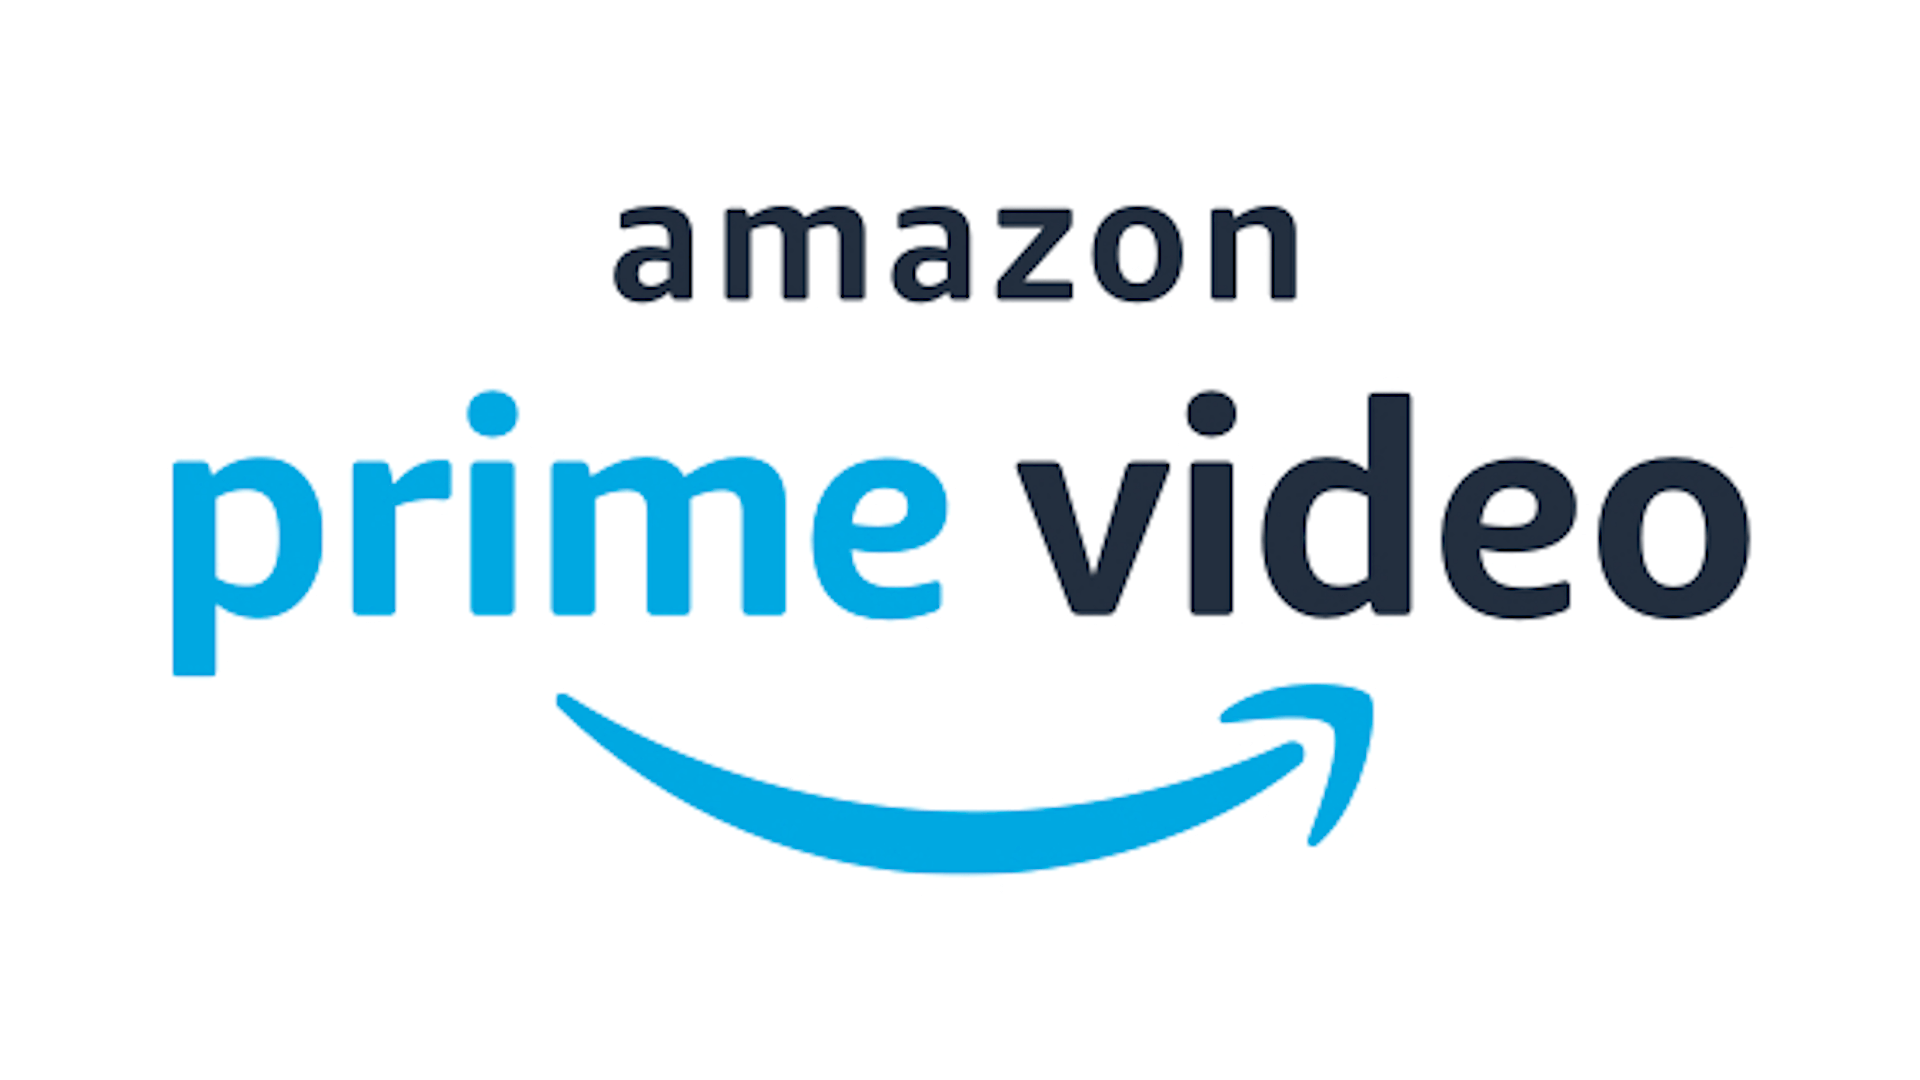 Amazonプライムビデオをテレビに登録する設定方法